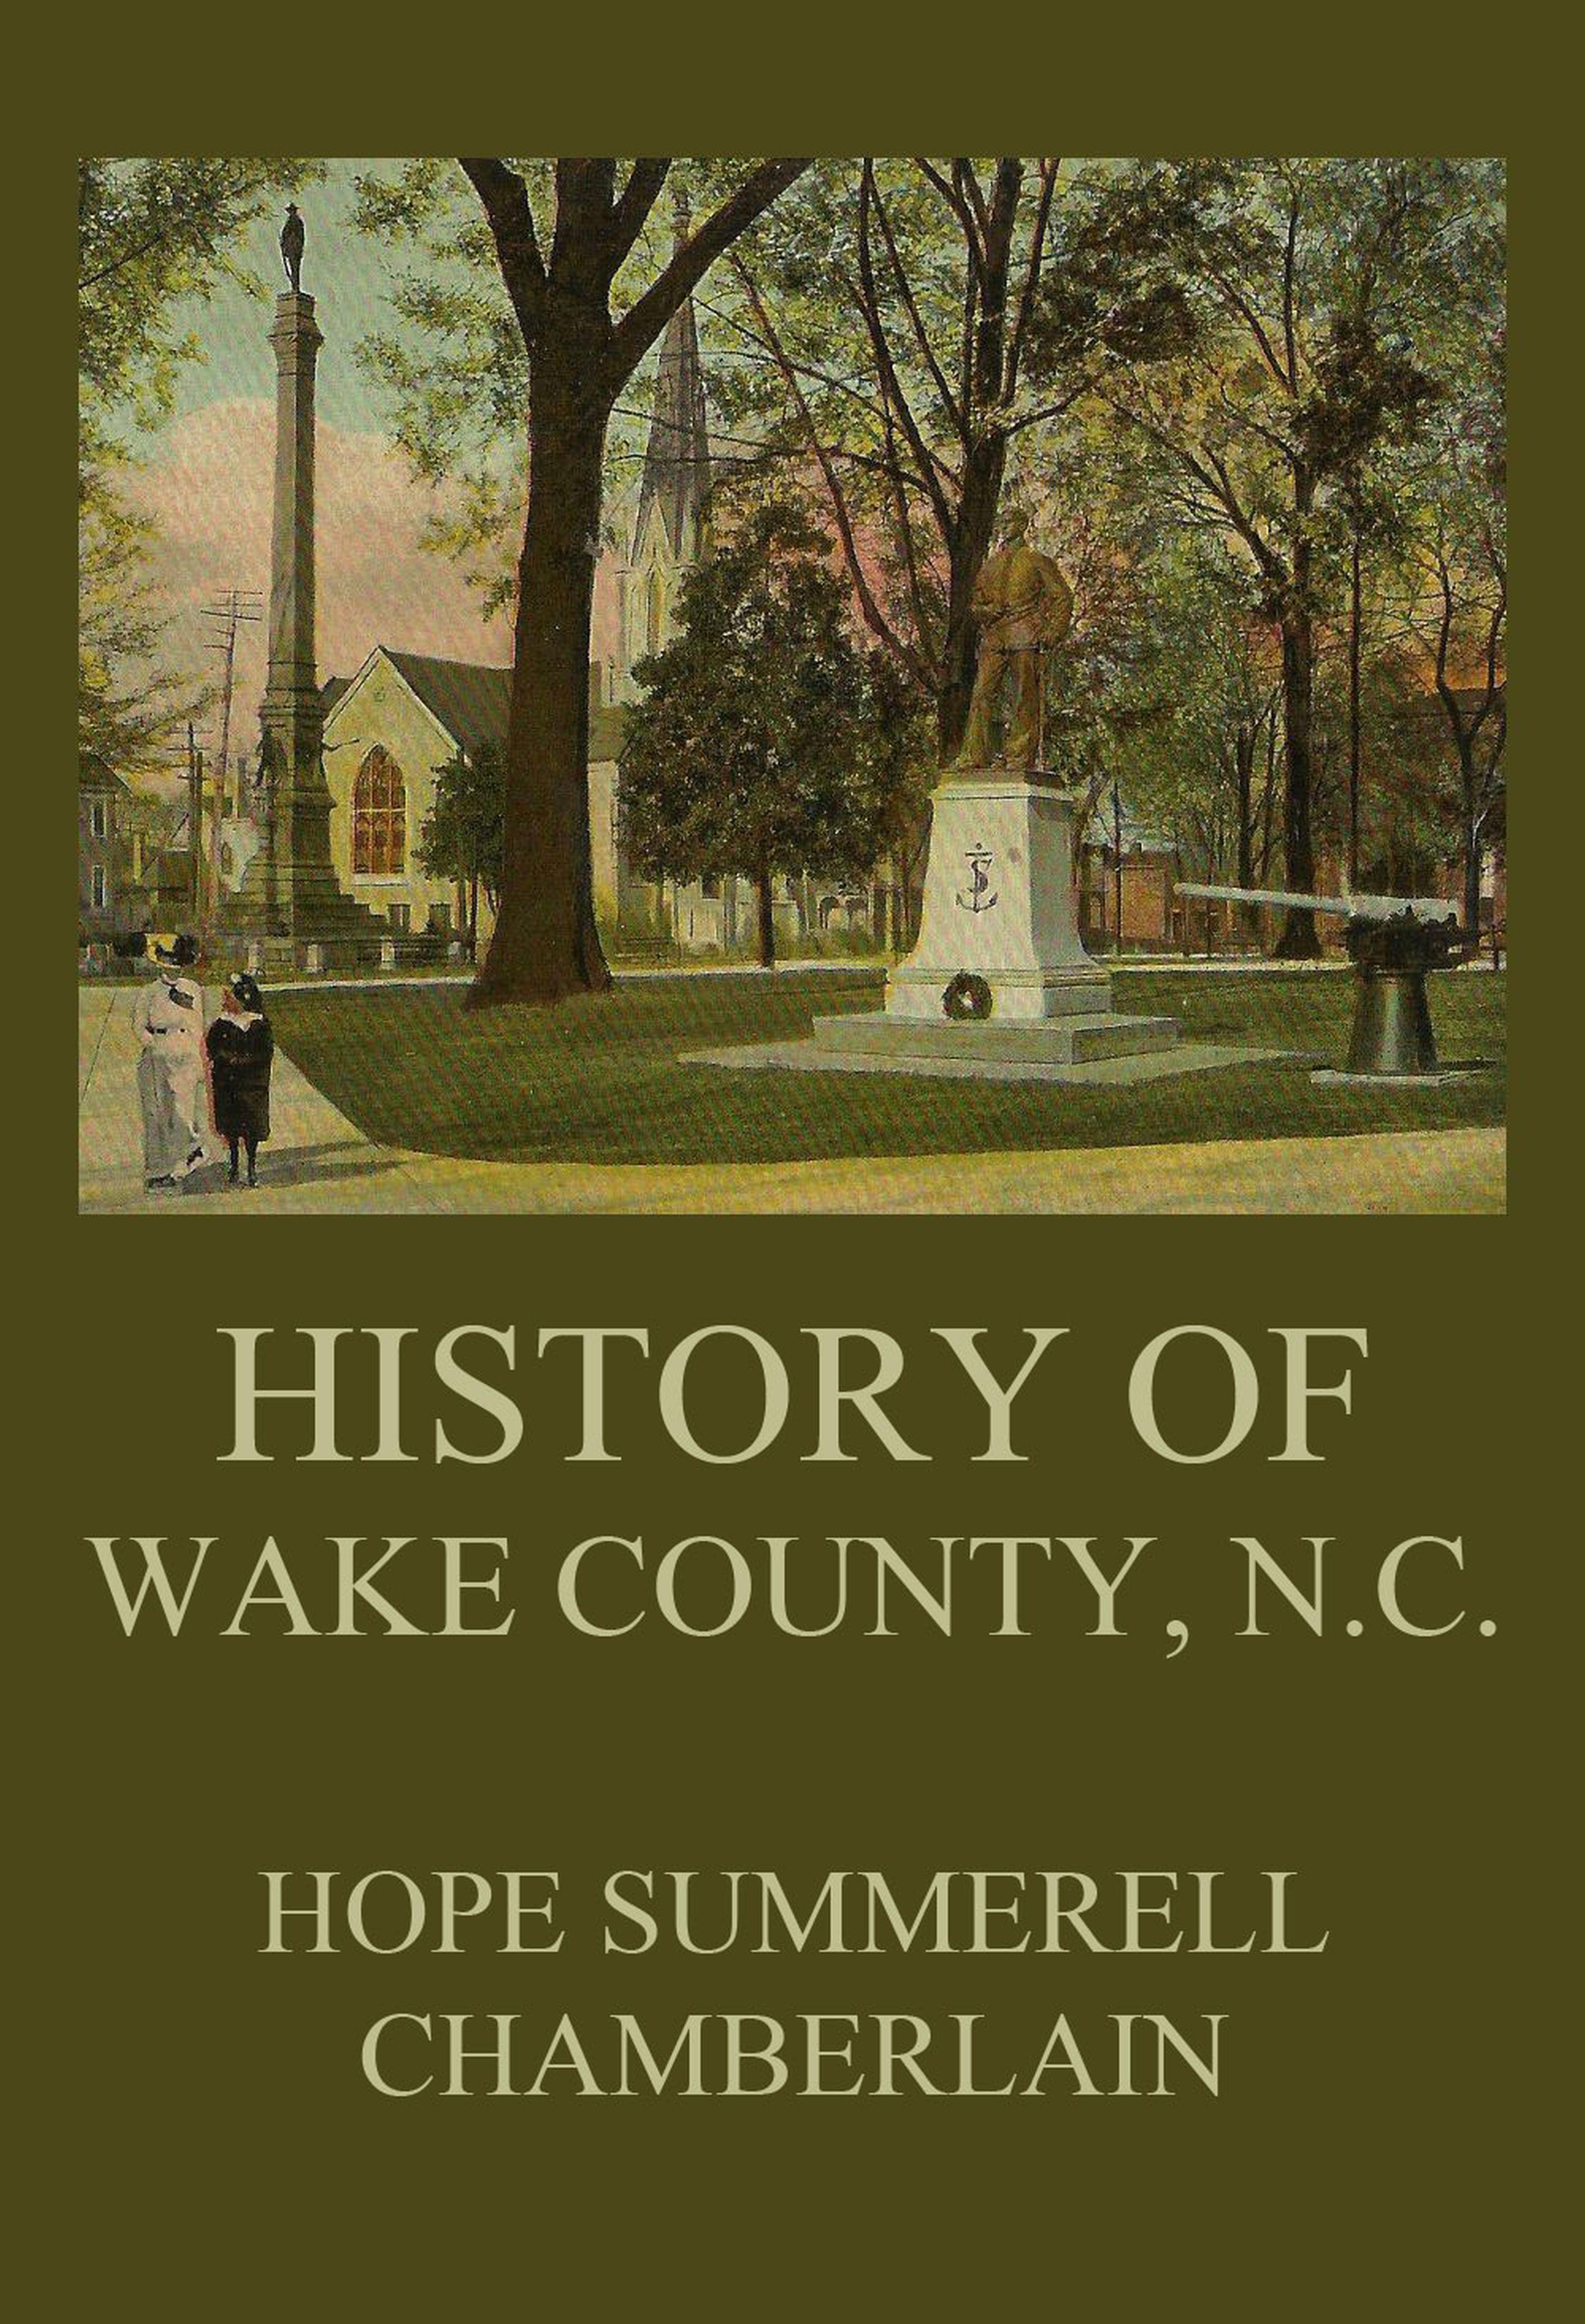 Hope Summerell Chamberlain History of Wake County, North Carolina north carolina adjutant general s dept annual report of the adjutant general of the state of north carolina for the year serial 1916